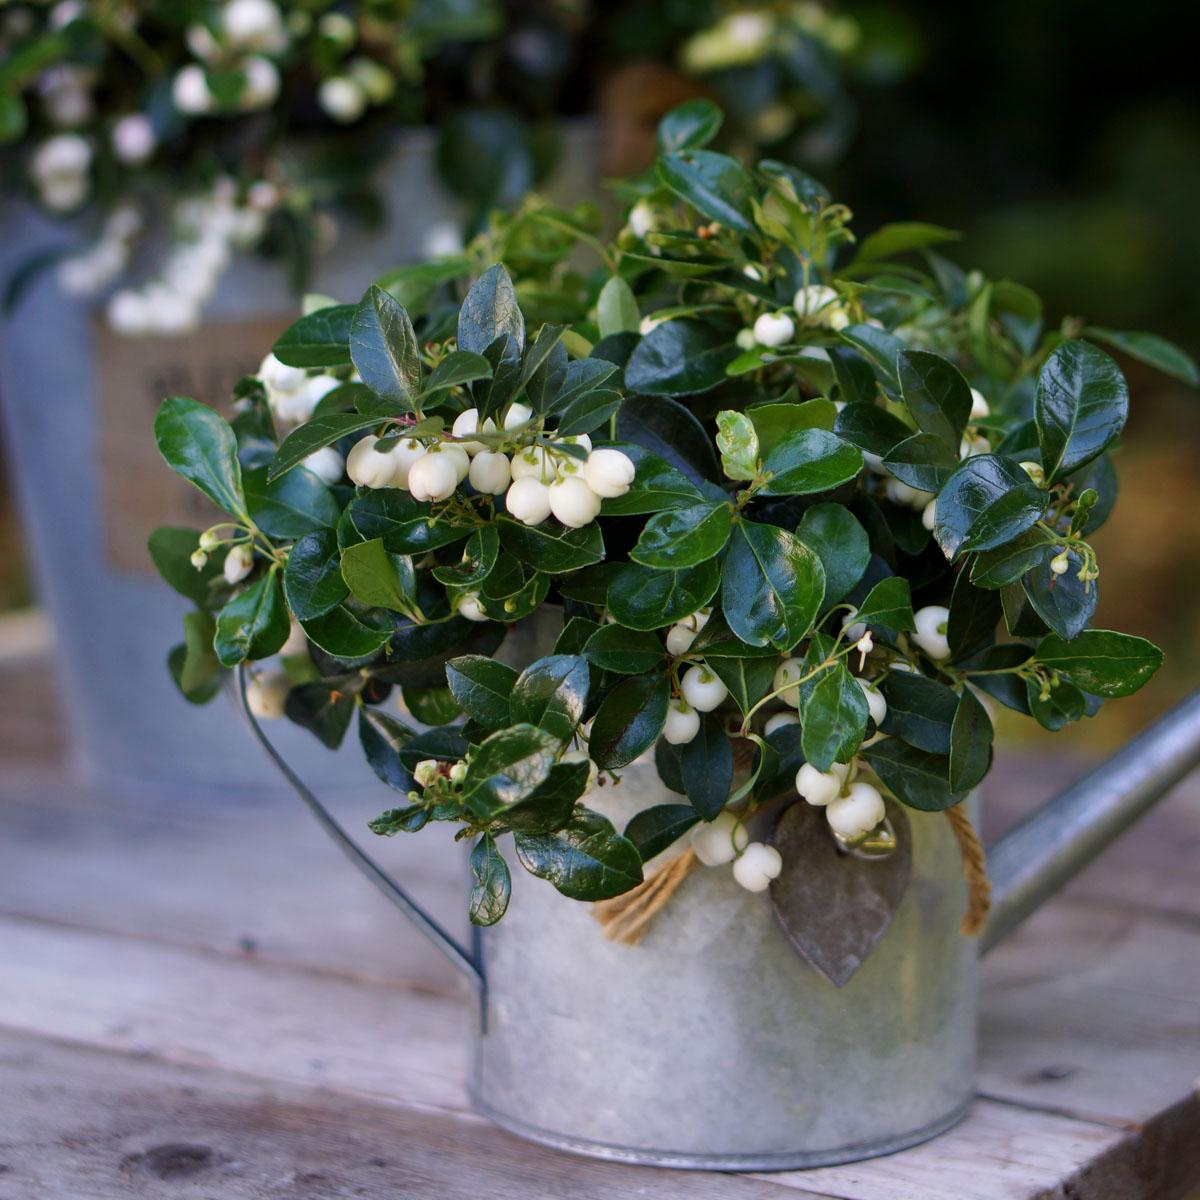 Gaultheria - procumbens -